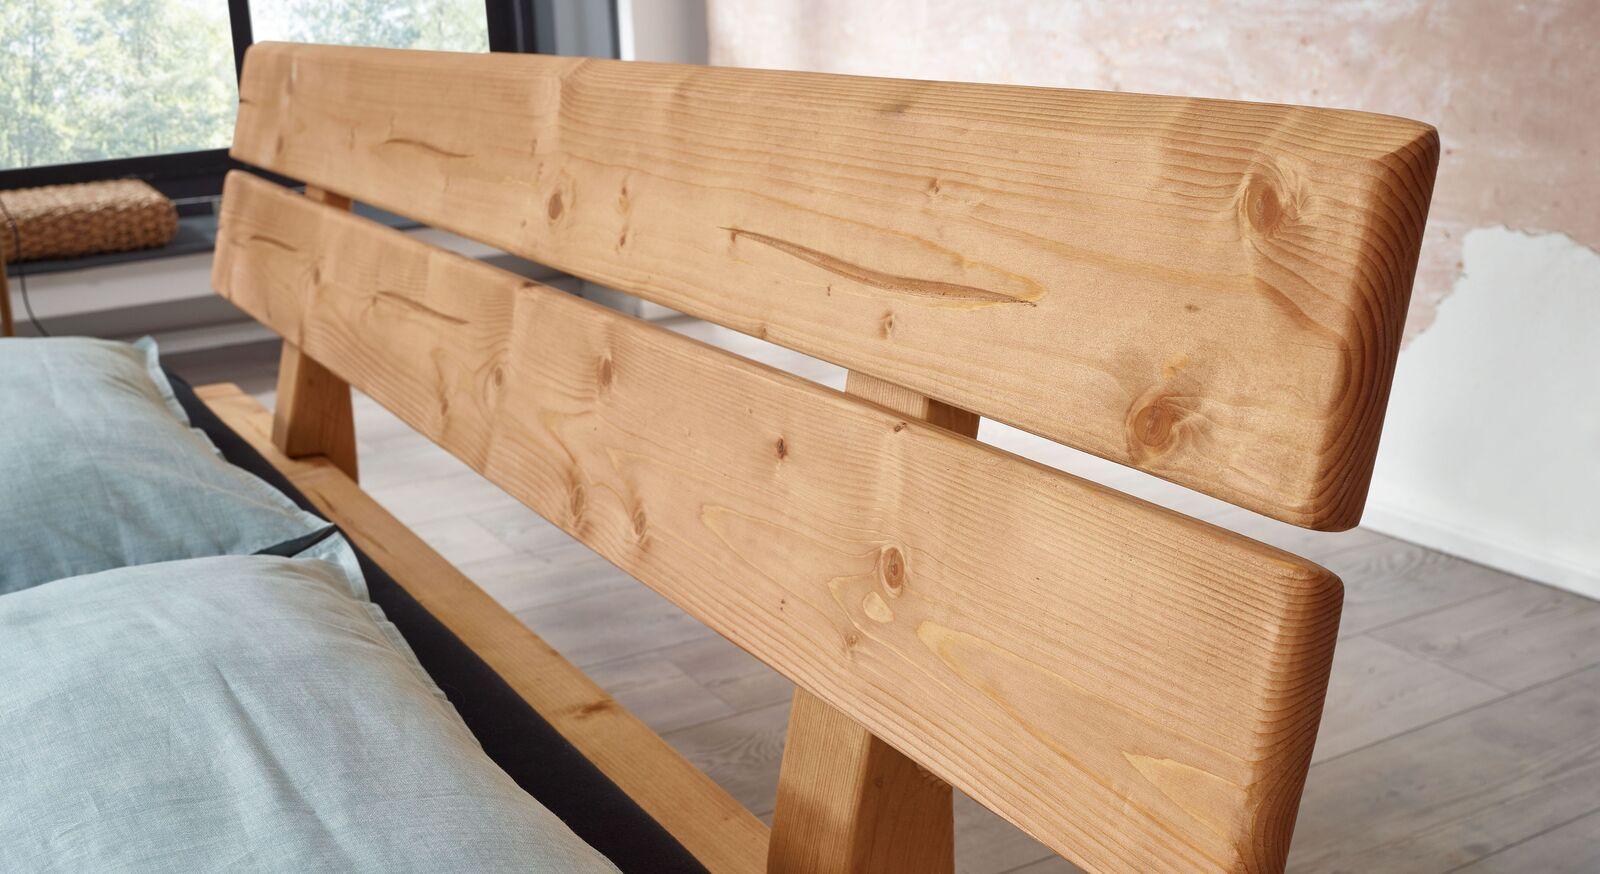 Bett Randers mit Holz-Fräsungen im Kopfteil